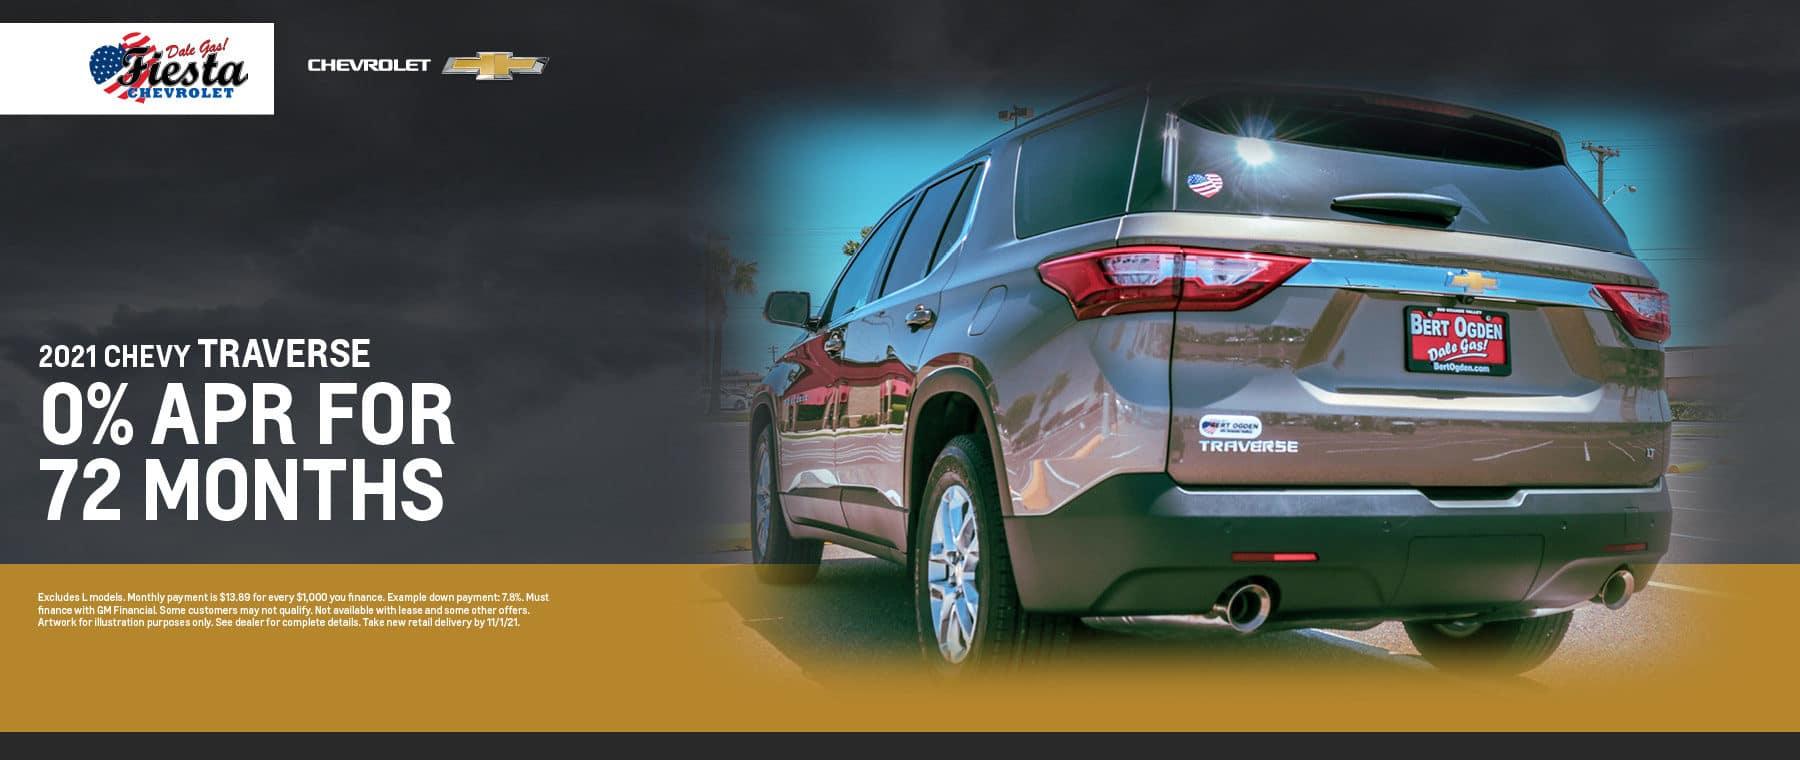 2021 Chevrolet Traverse Offer   Fiesta Chevrolet in Edinburg, Texas